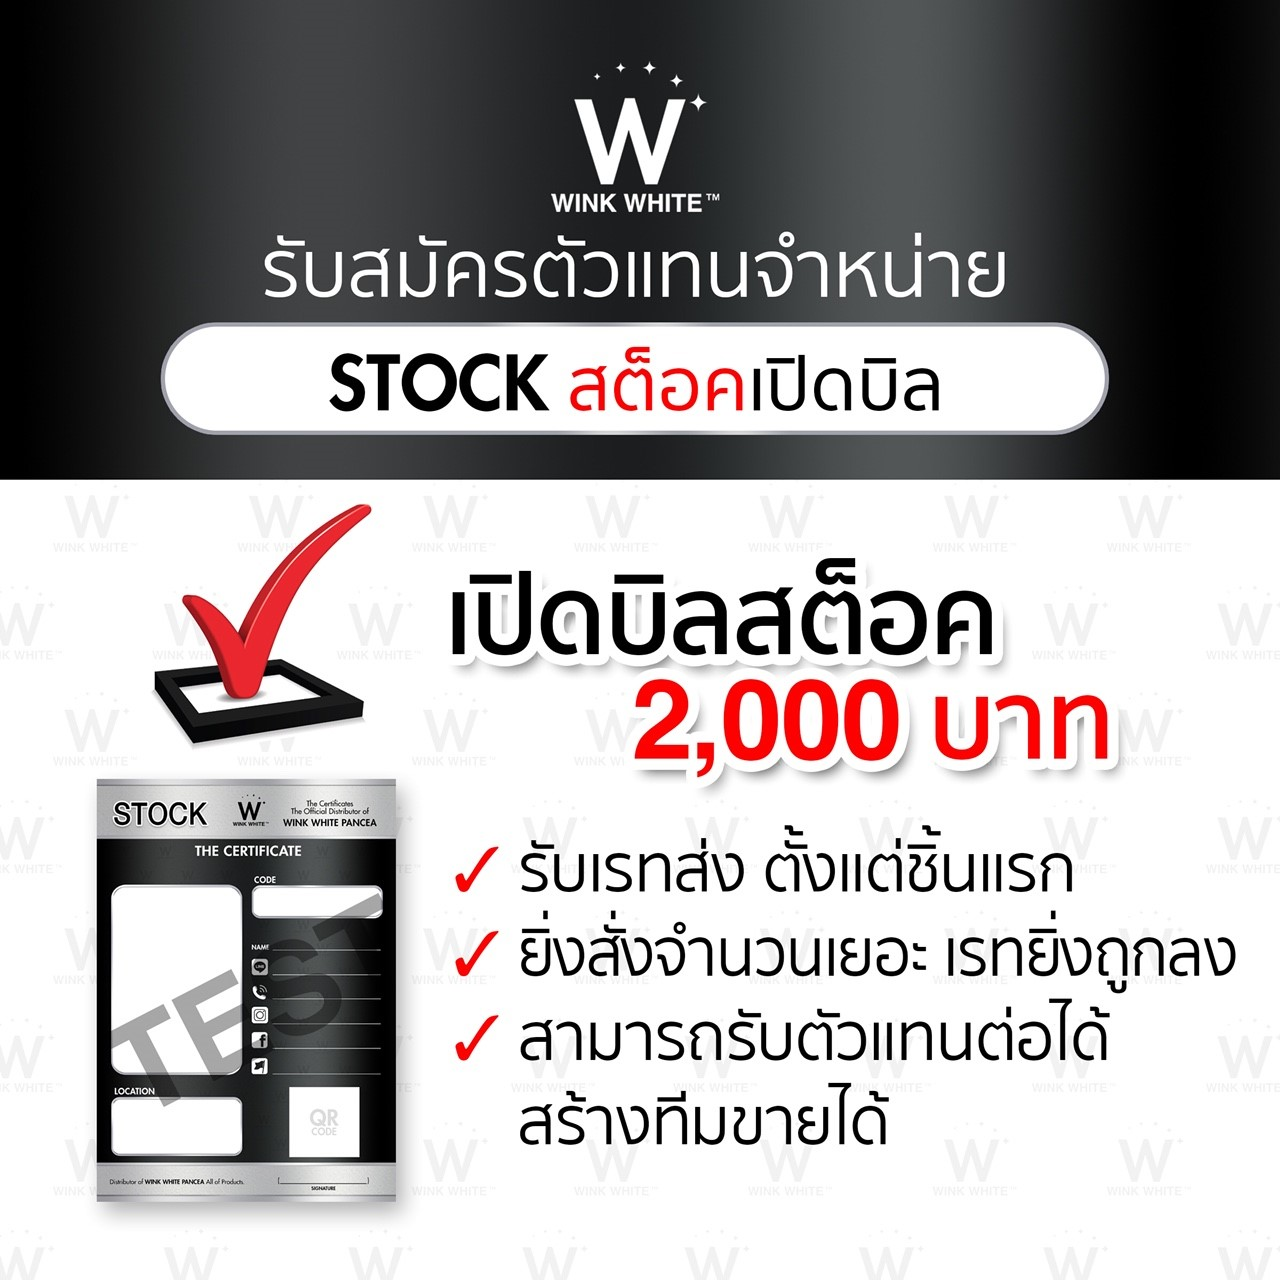 WINKWHITE สมัครตัวแทนจำหน่าย วิงค์ไวท์ แบบ STOCK เปิดบิลซื้อสินค้า 2,000 บาท